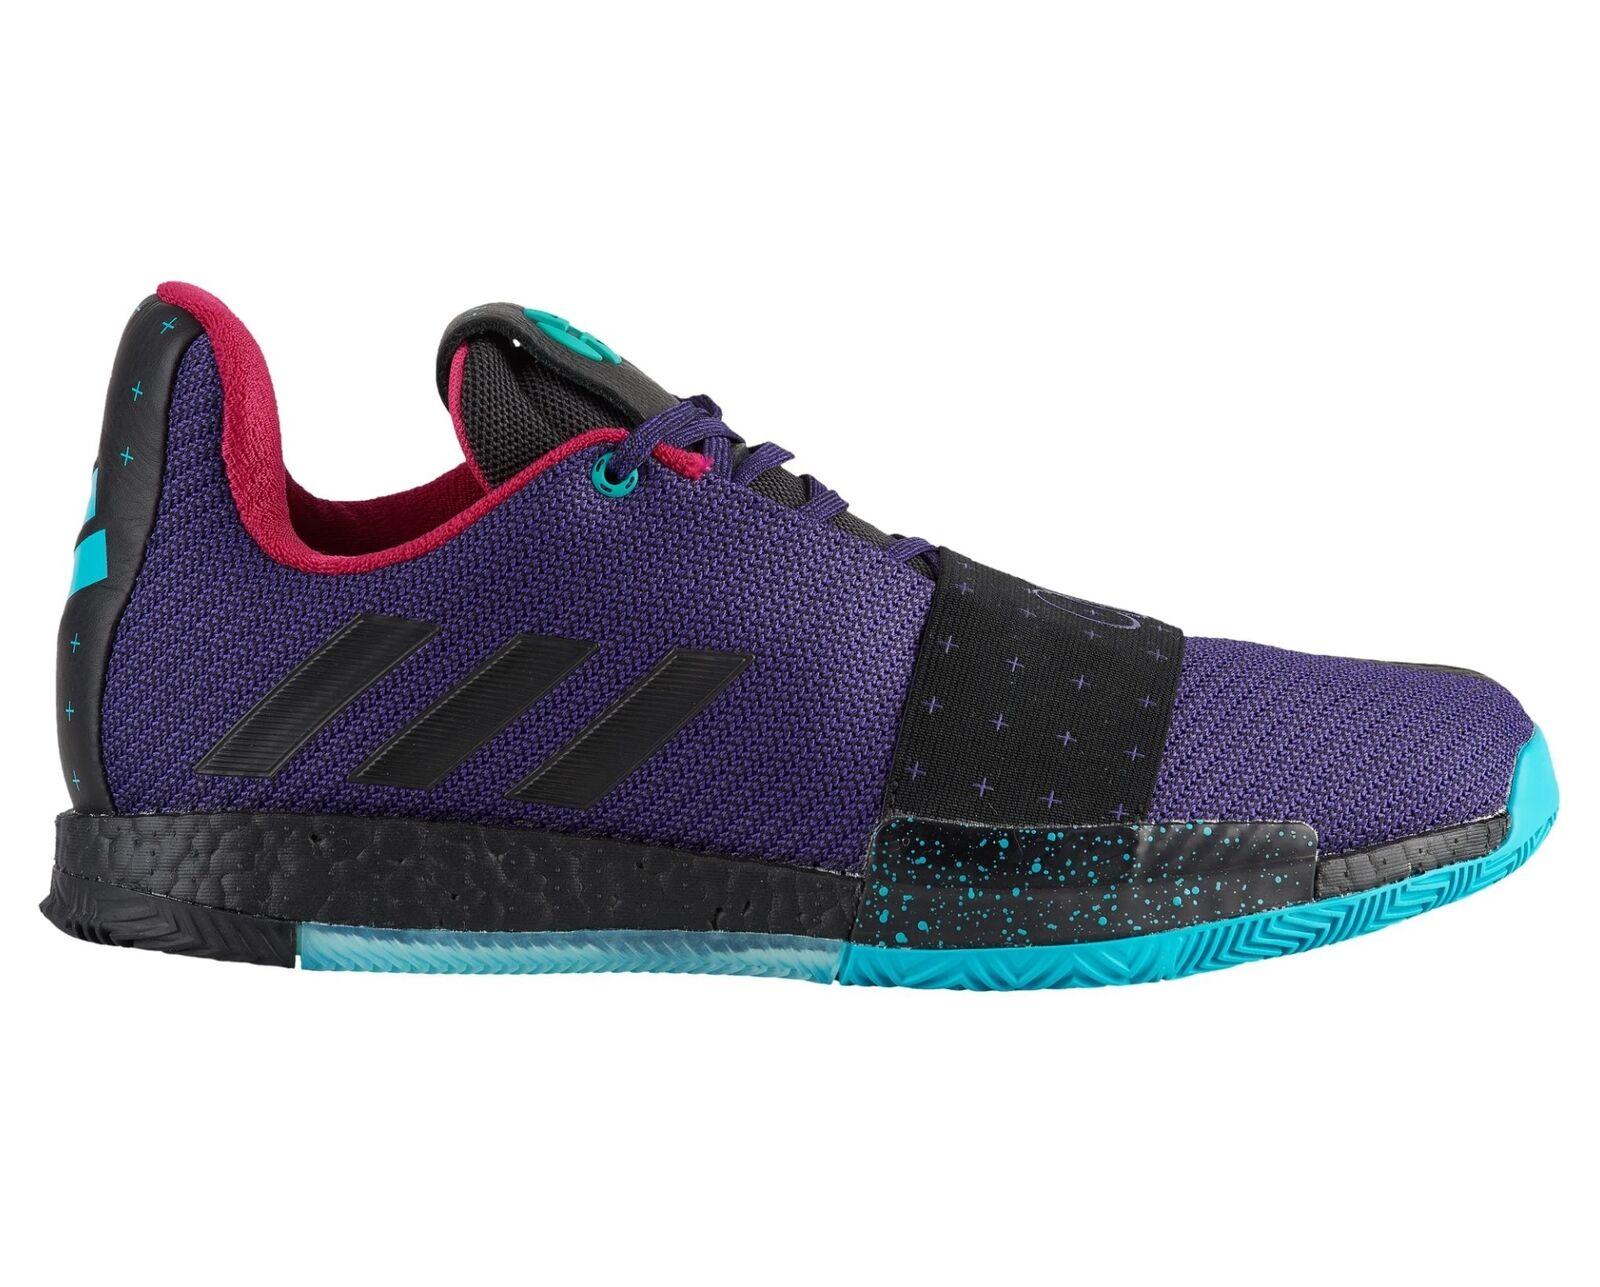 Adidas Harden Vol. Vol. Vol. 3 Drew League Uomo B42005 viola Basketball scarpe Dimensione 13 6a6765